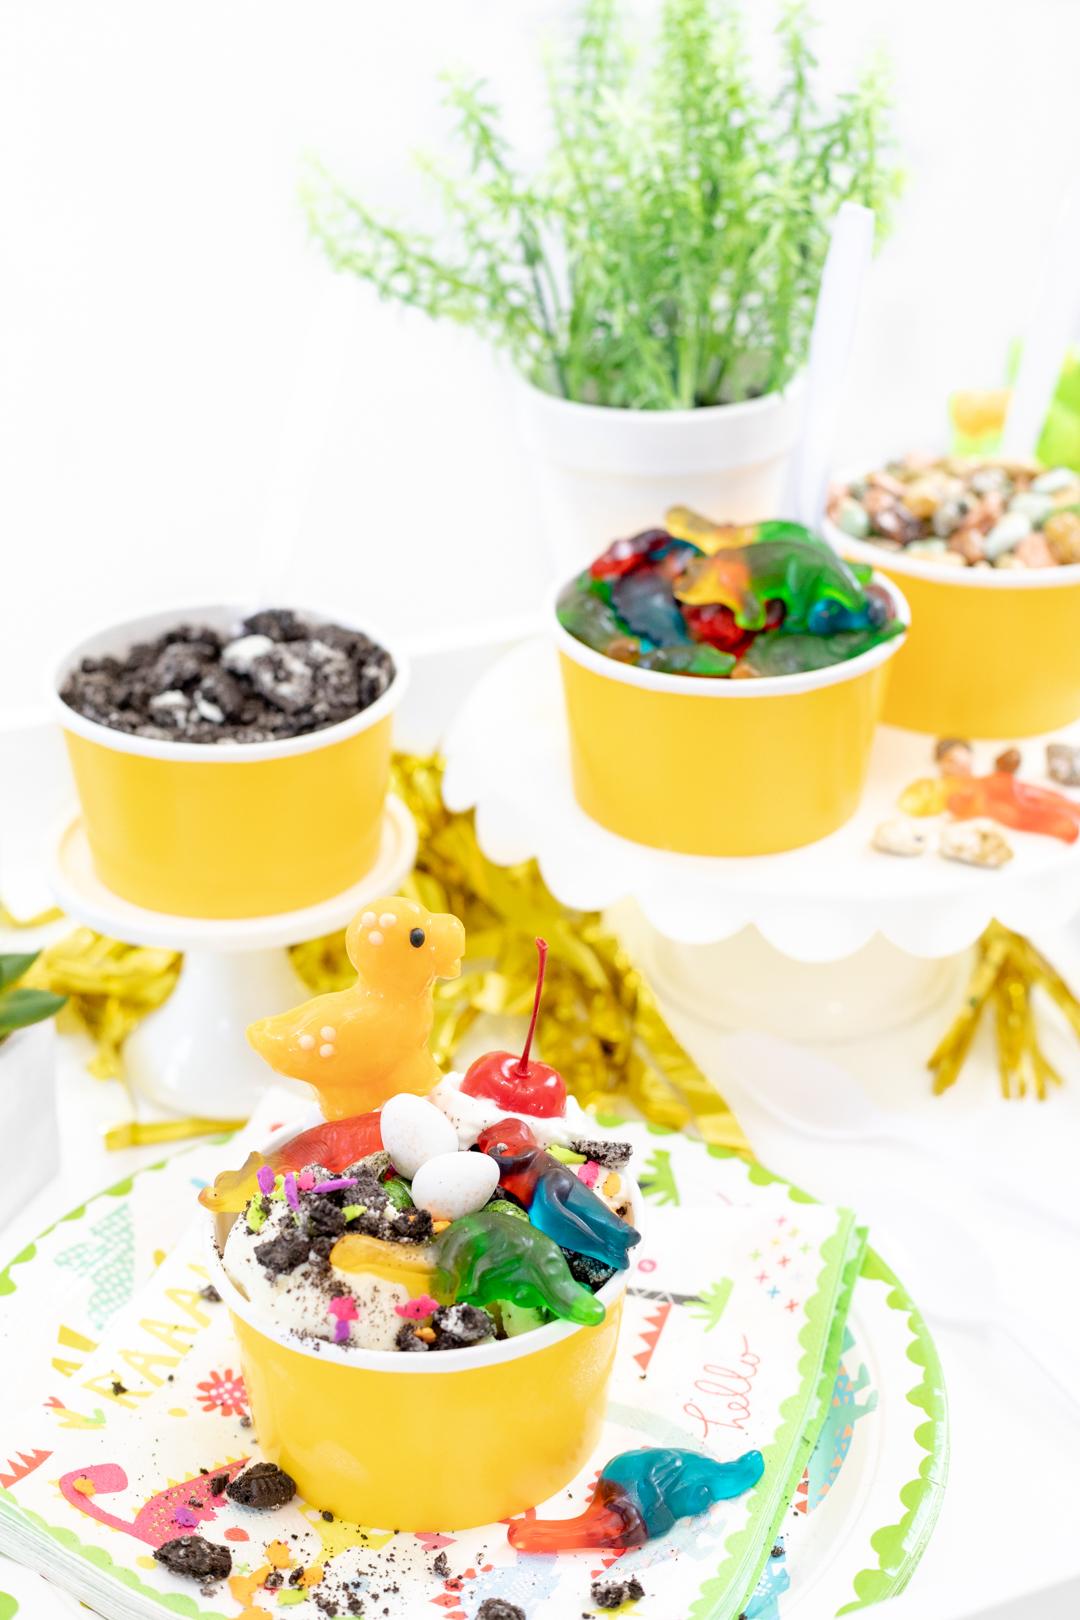 dino party ice cream sundae